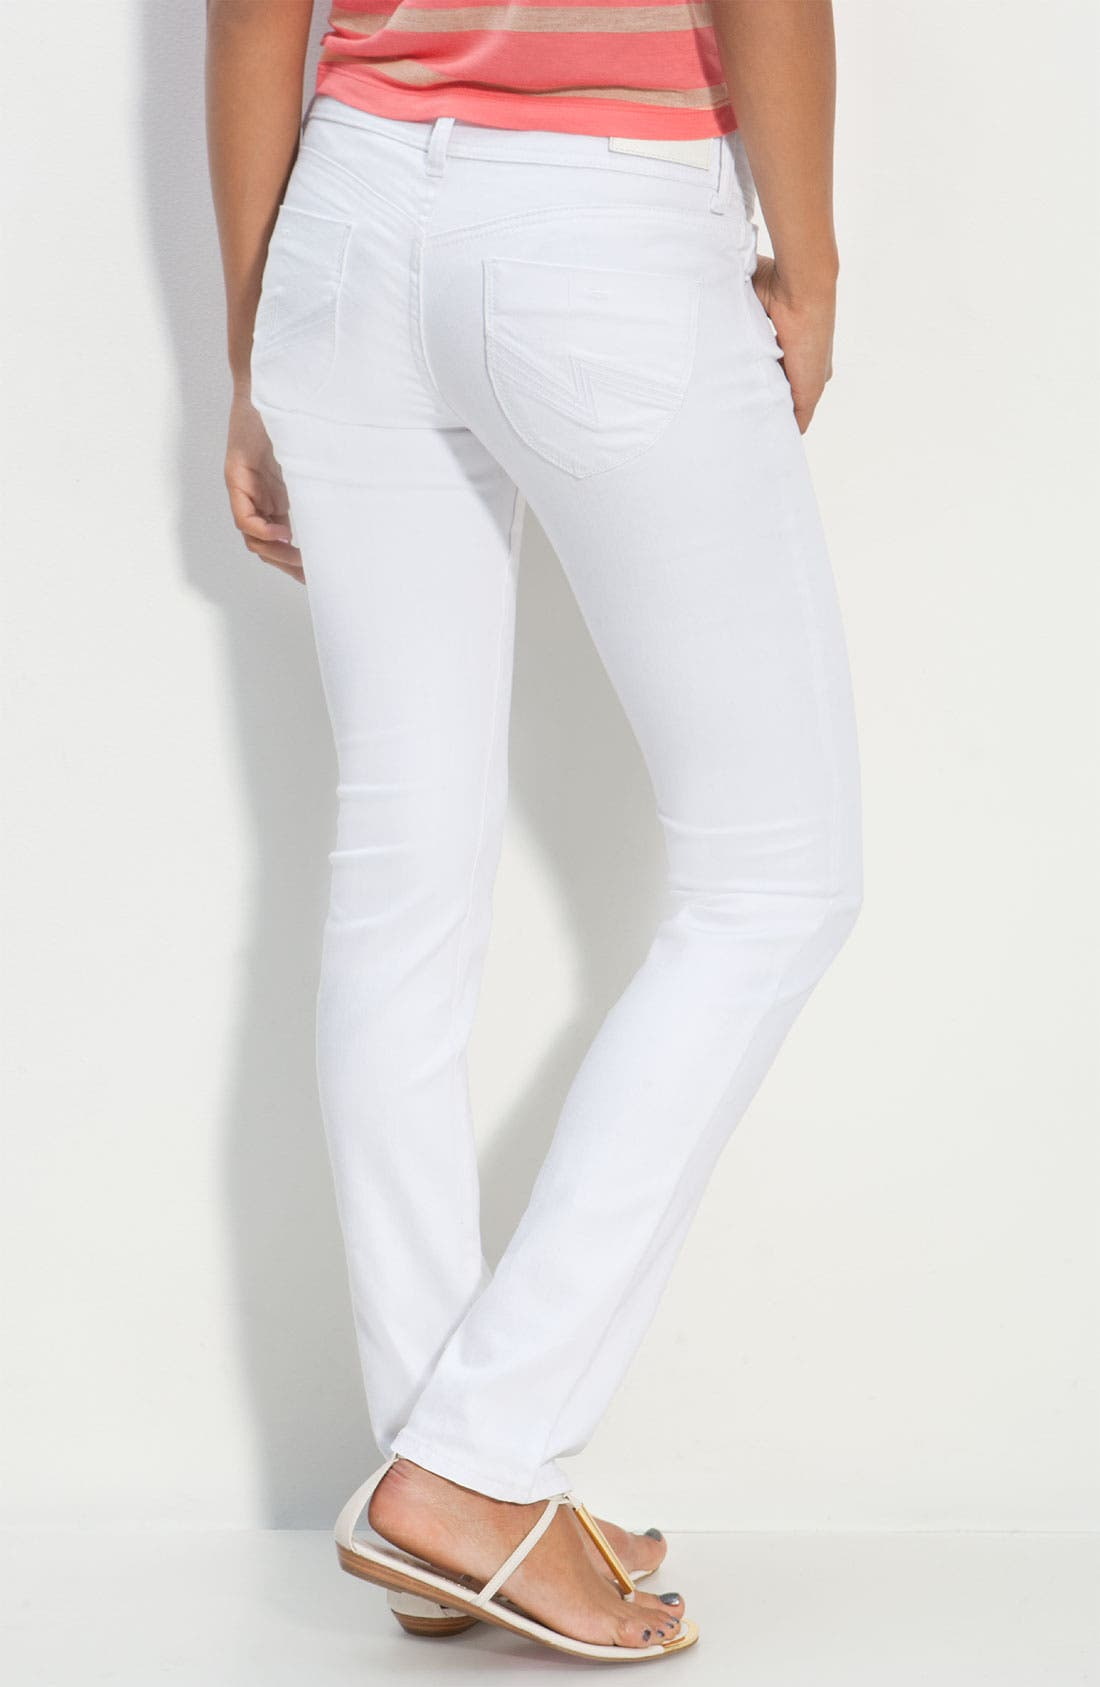 Alternate Image 1 Selected - S.O.N.G. Skinny Leg Jeans (Crystal White Wash) (Juniors)